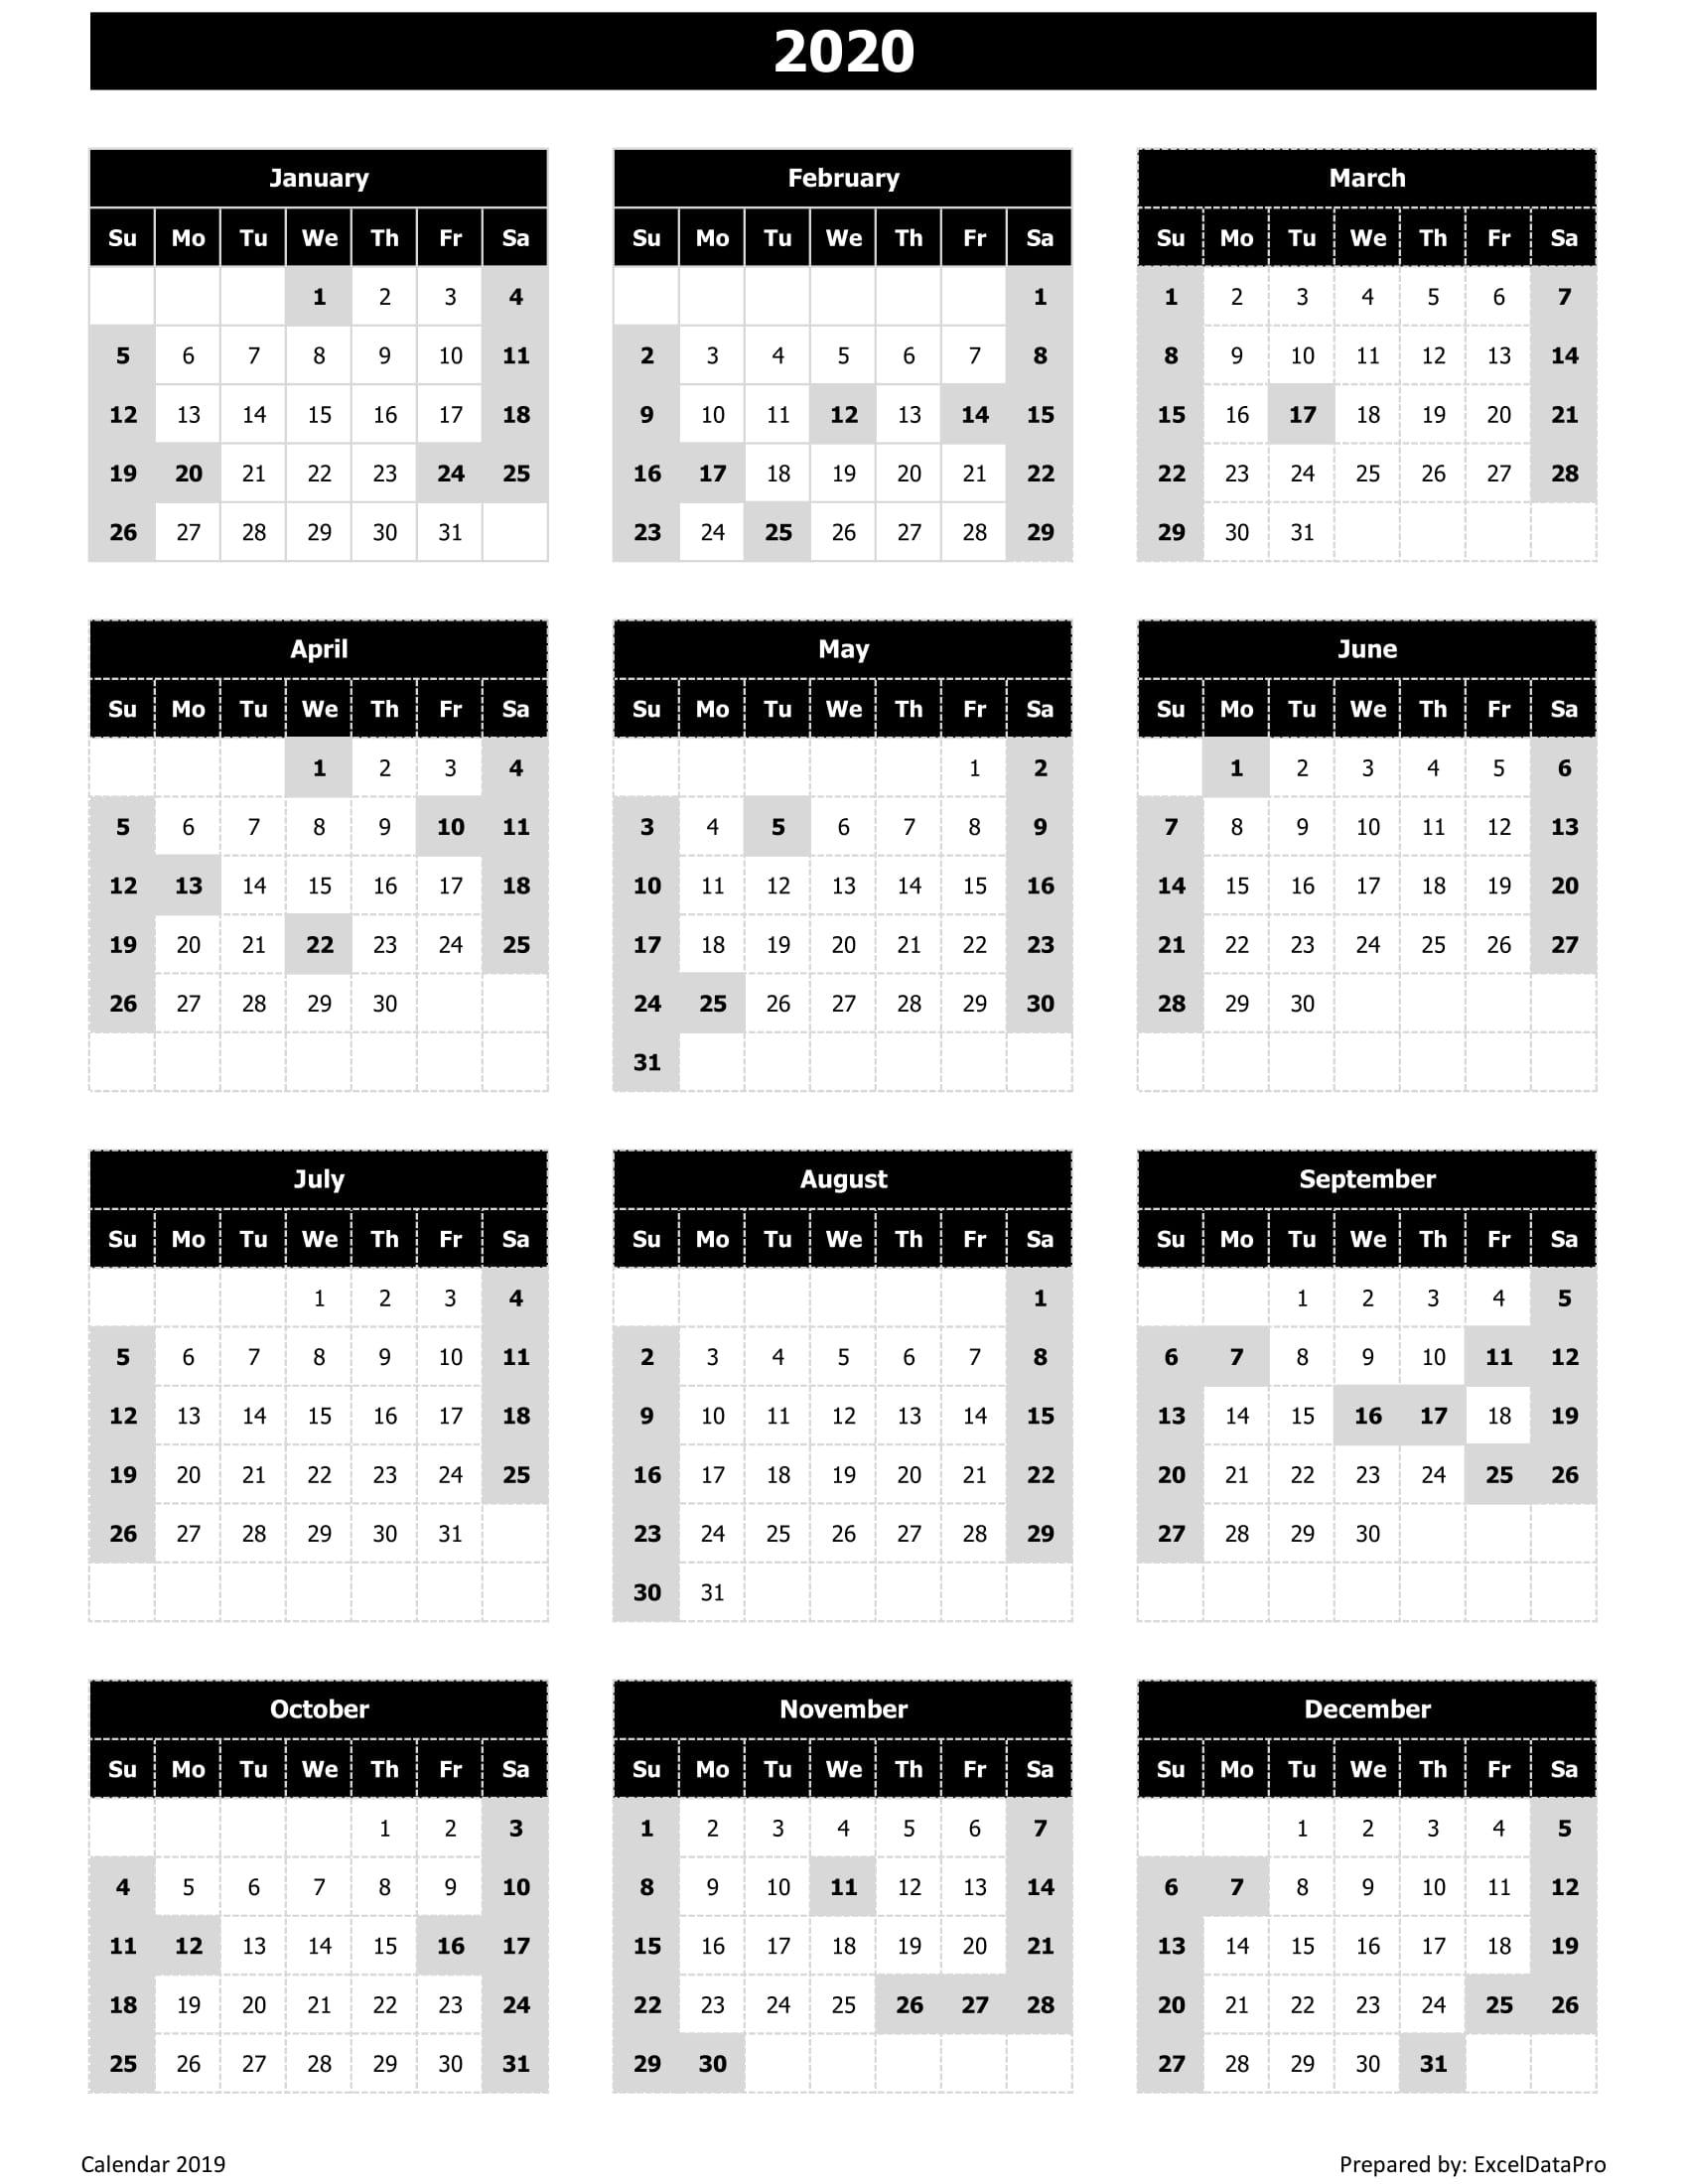 Download 2020 Yearly Calendar (Sun Start) Excel Template - Exceldatapro in Employee Attendance Calendar 2020 Prntable